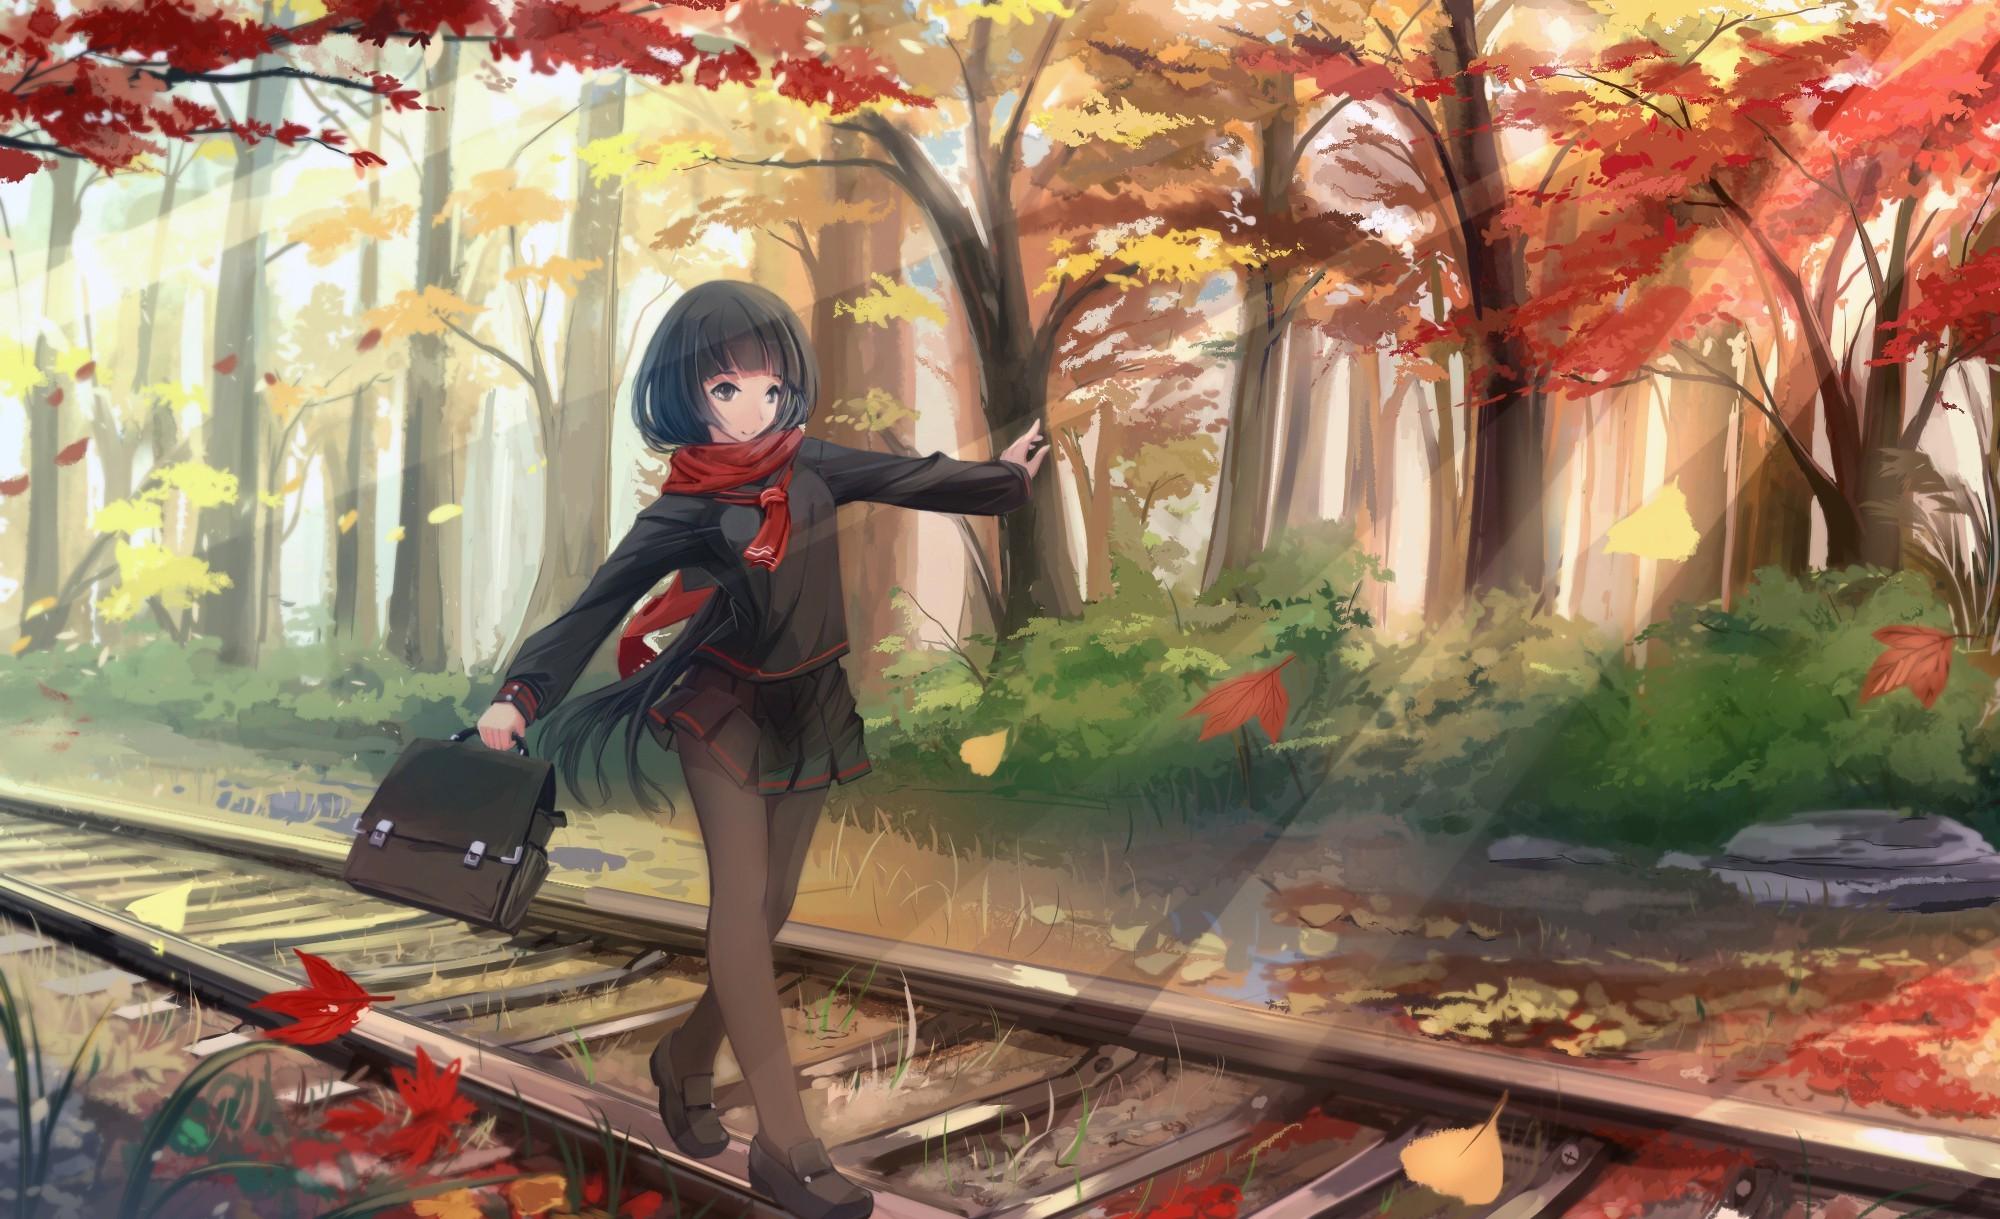 anime Girls, Original Characters, Fall, Black Hair, Scarf, Leaves, Long  Hair, Pantyhose, School Uniform, Trees Wallpapers HD / Desktop and Mobile  …